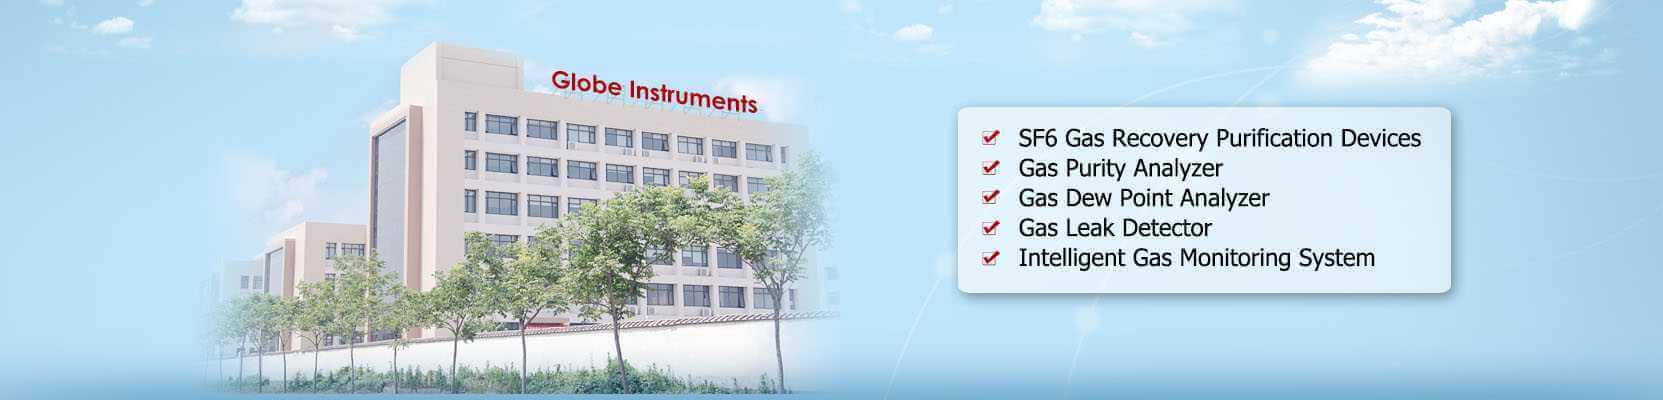 banner1 Office buildings globeinstrument